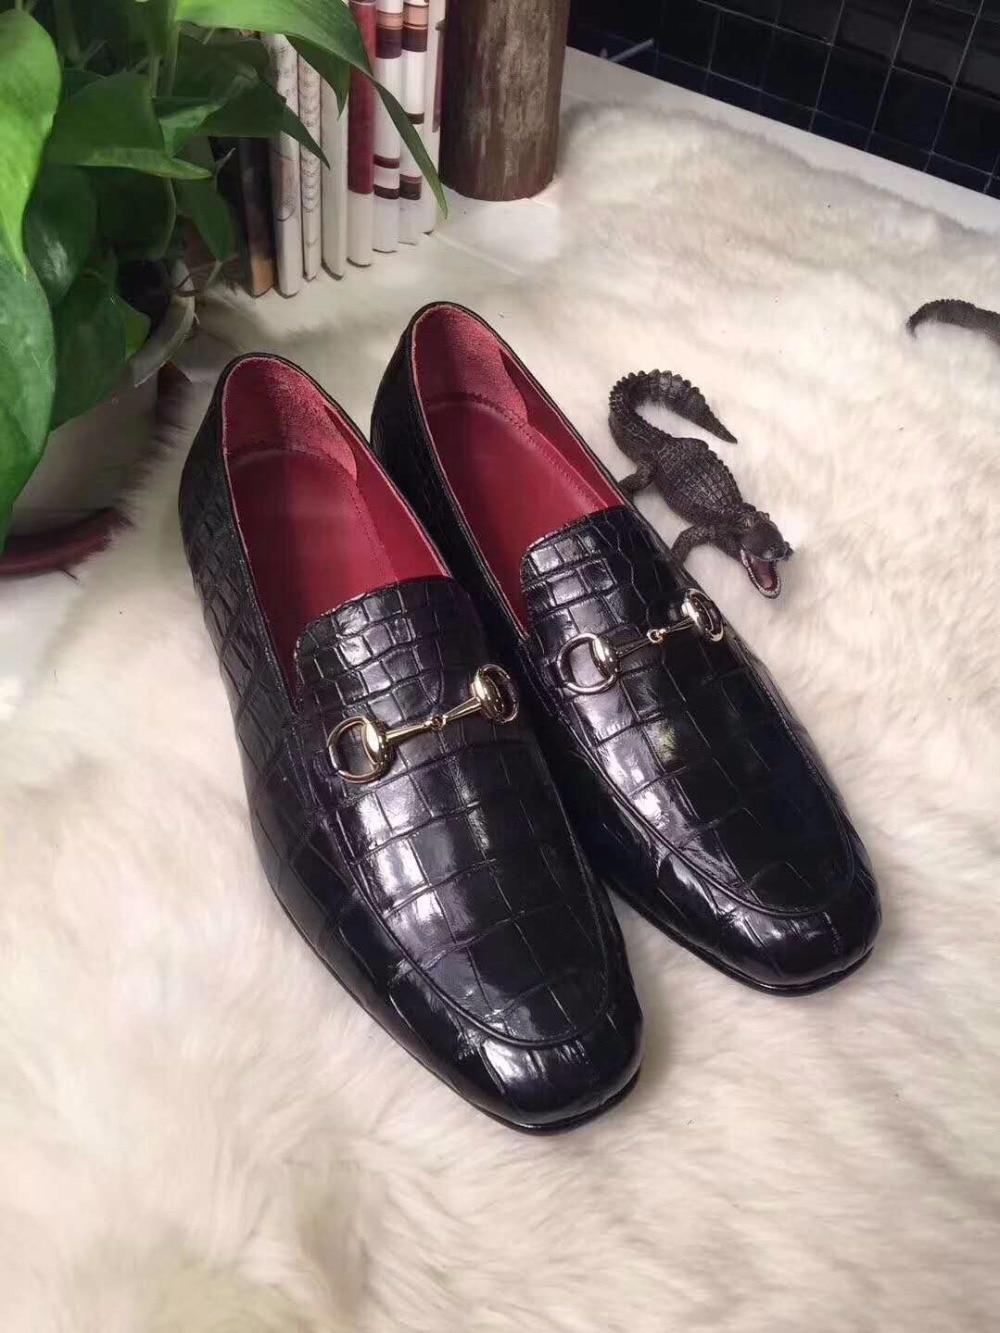 2018 Genuine real genuine crocodil belly skin men business shoe, top quality crocodile skin men shoe black brown color